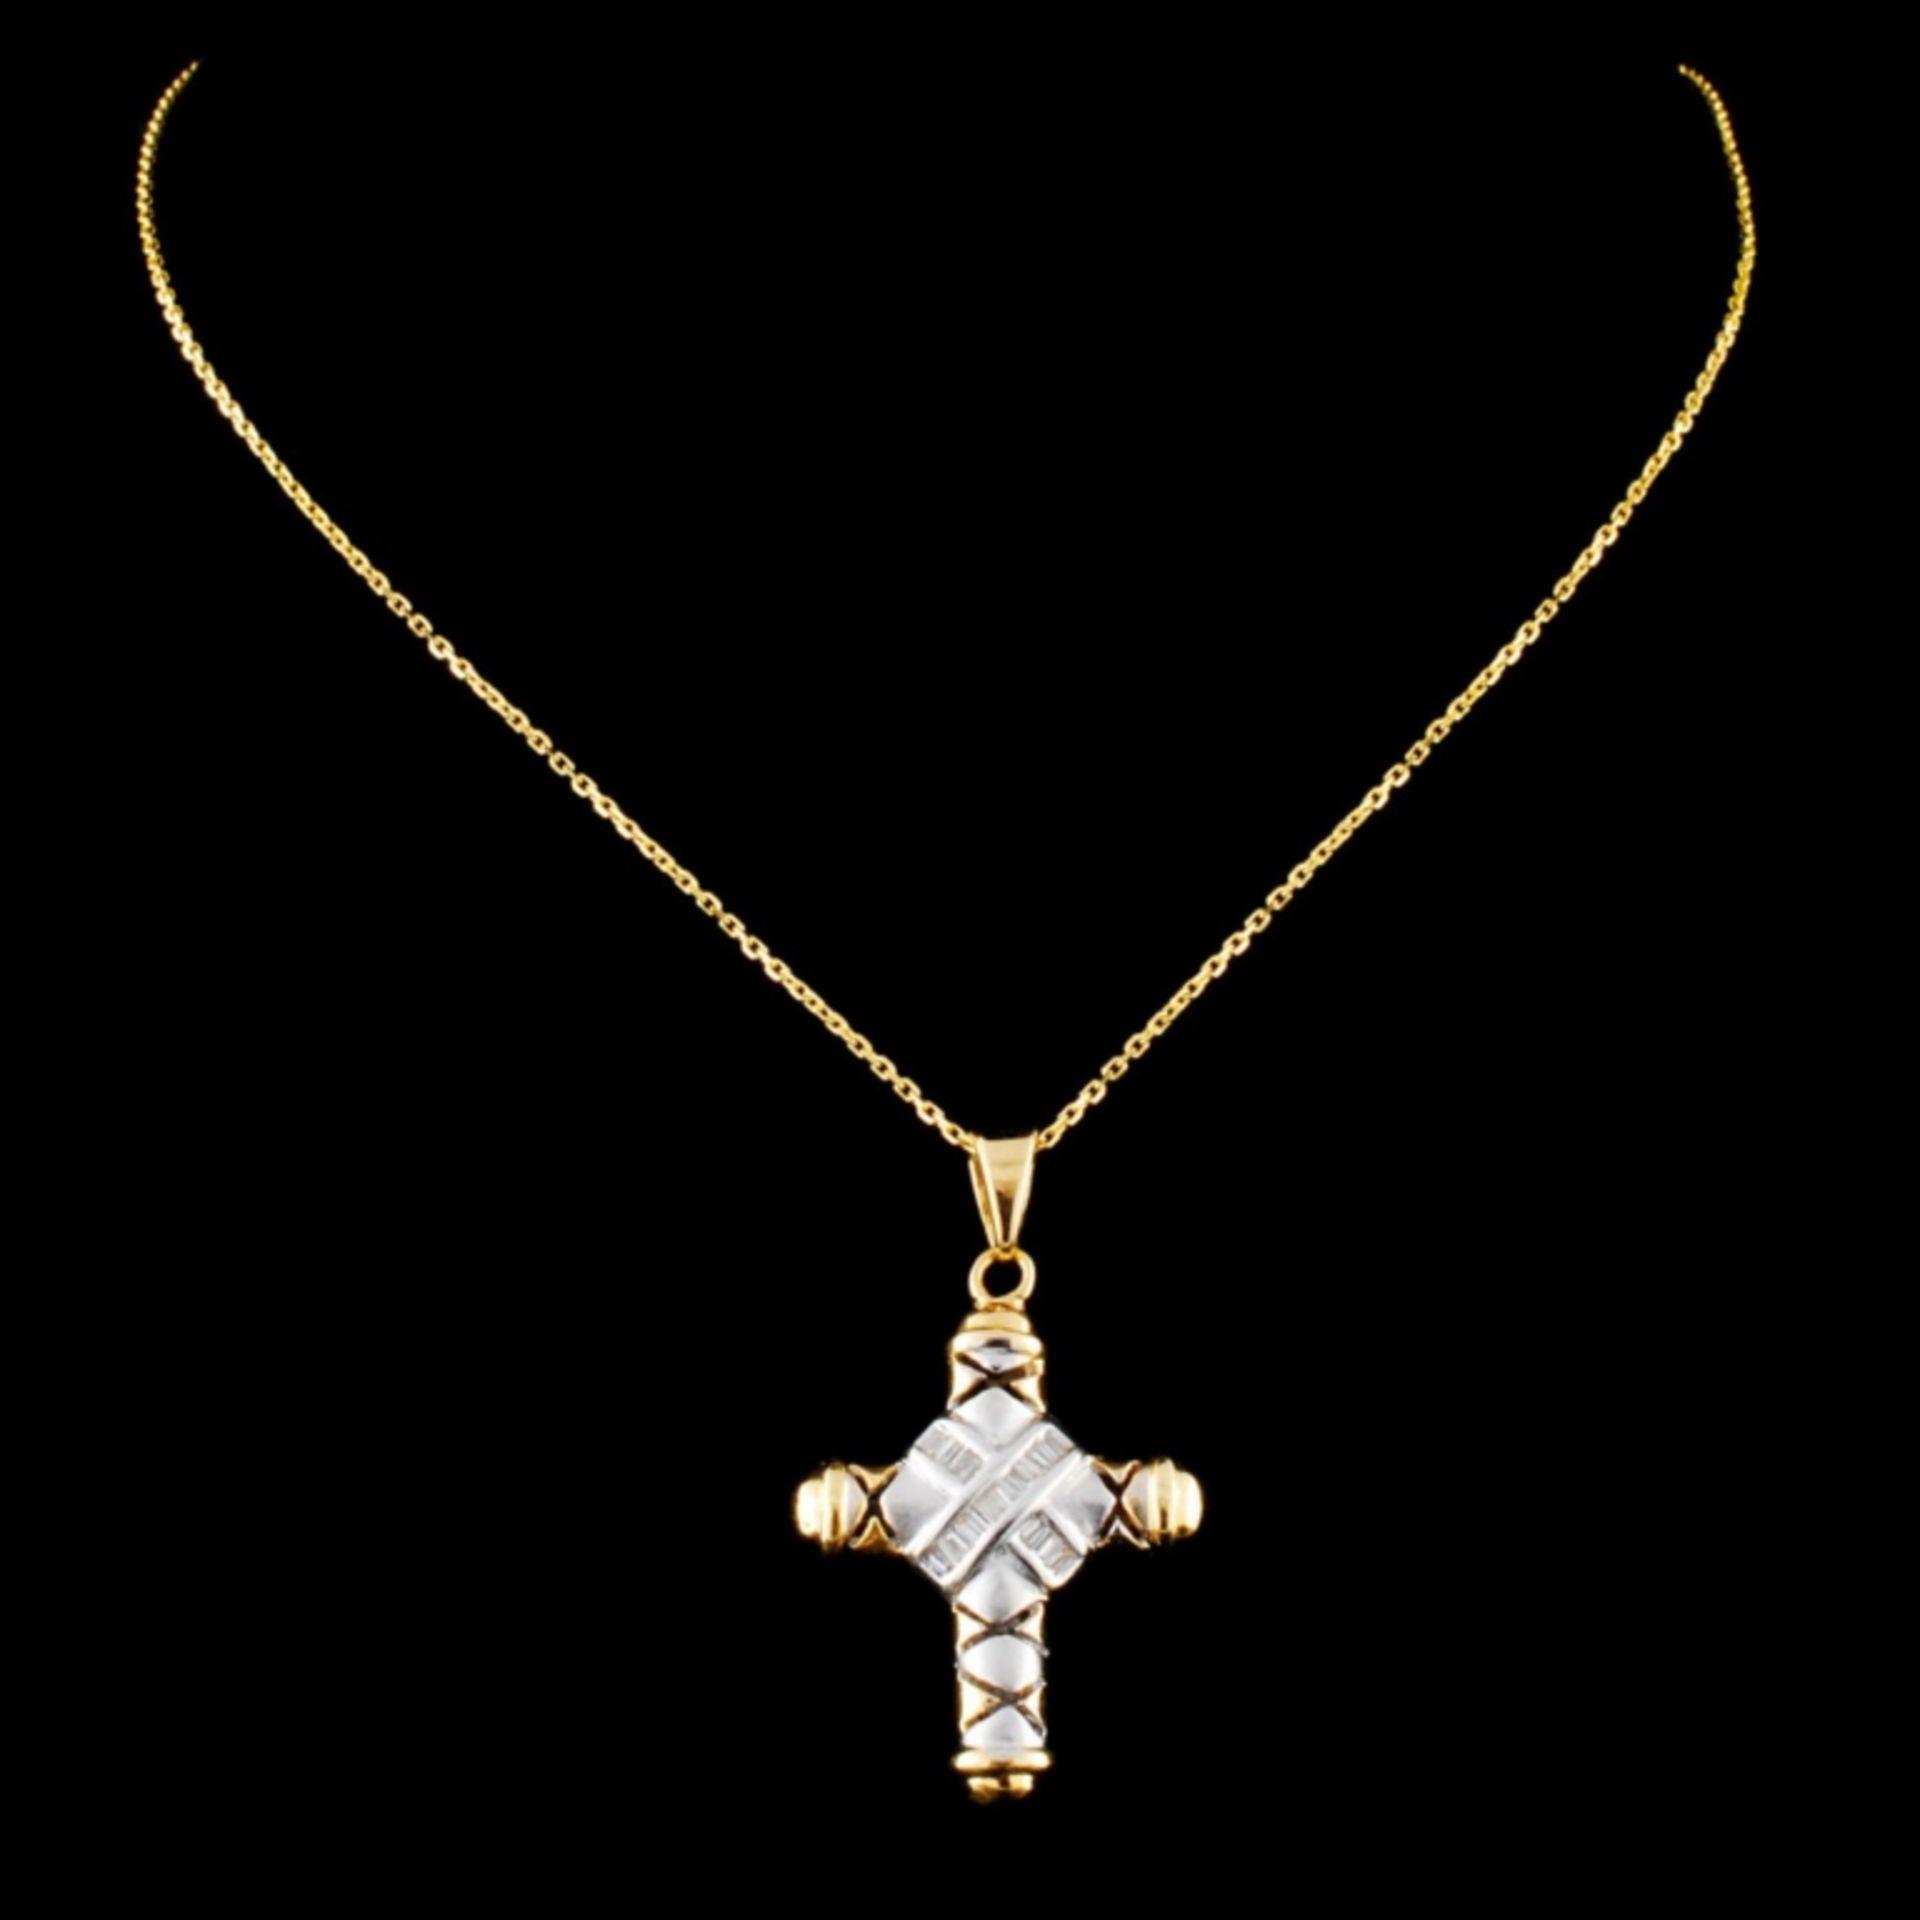 14K Gold 0.27ctw Diamond Pendant - Image 2 of 4